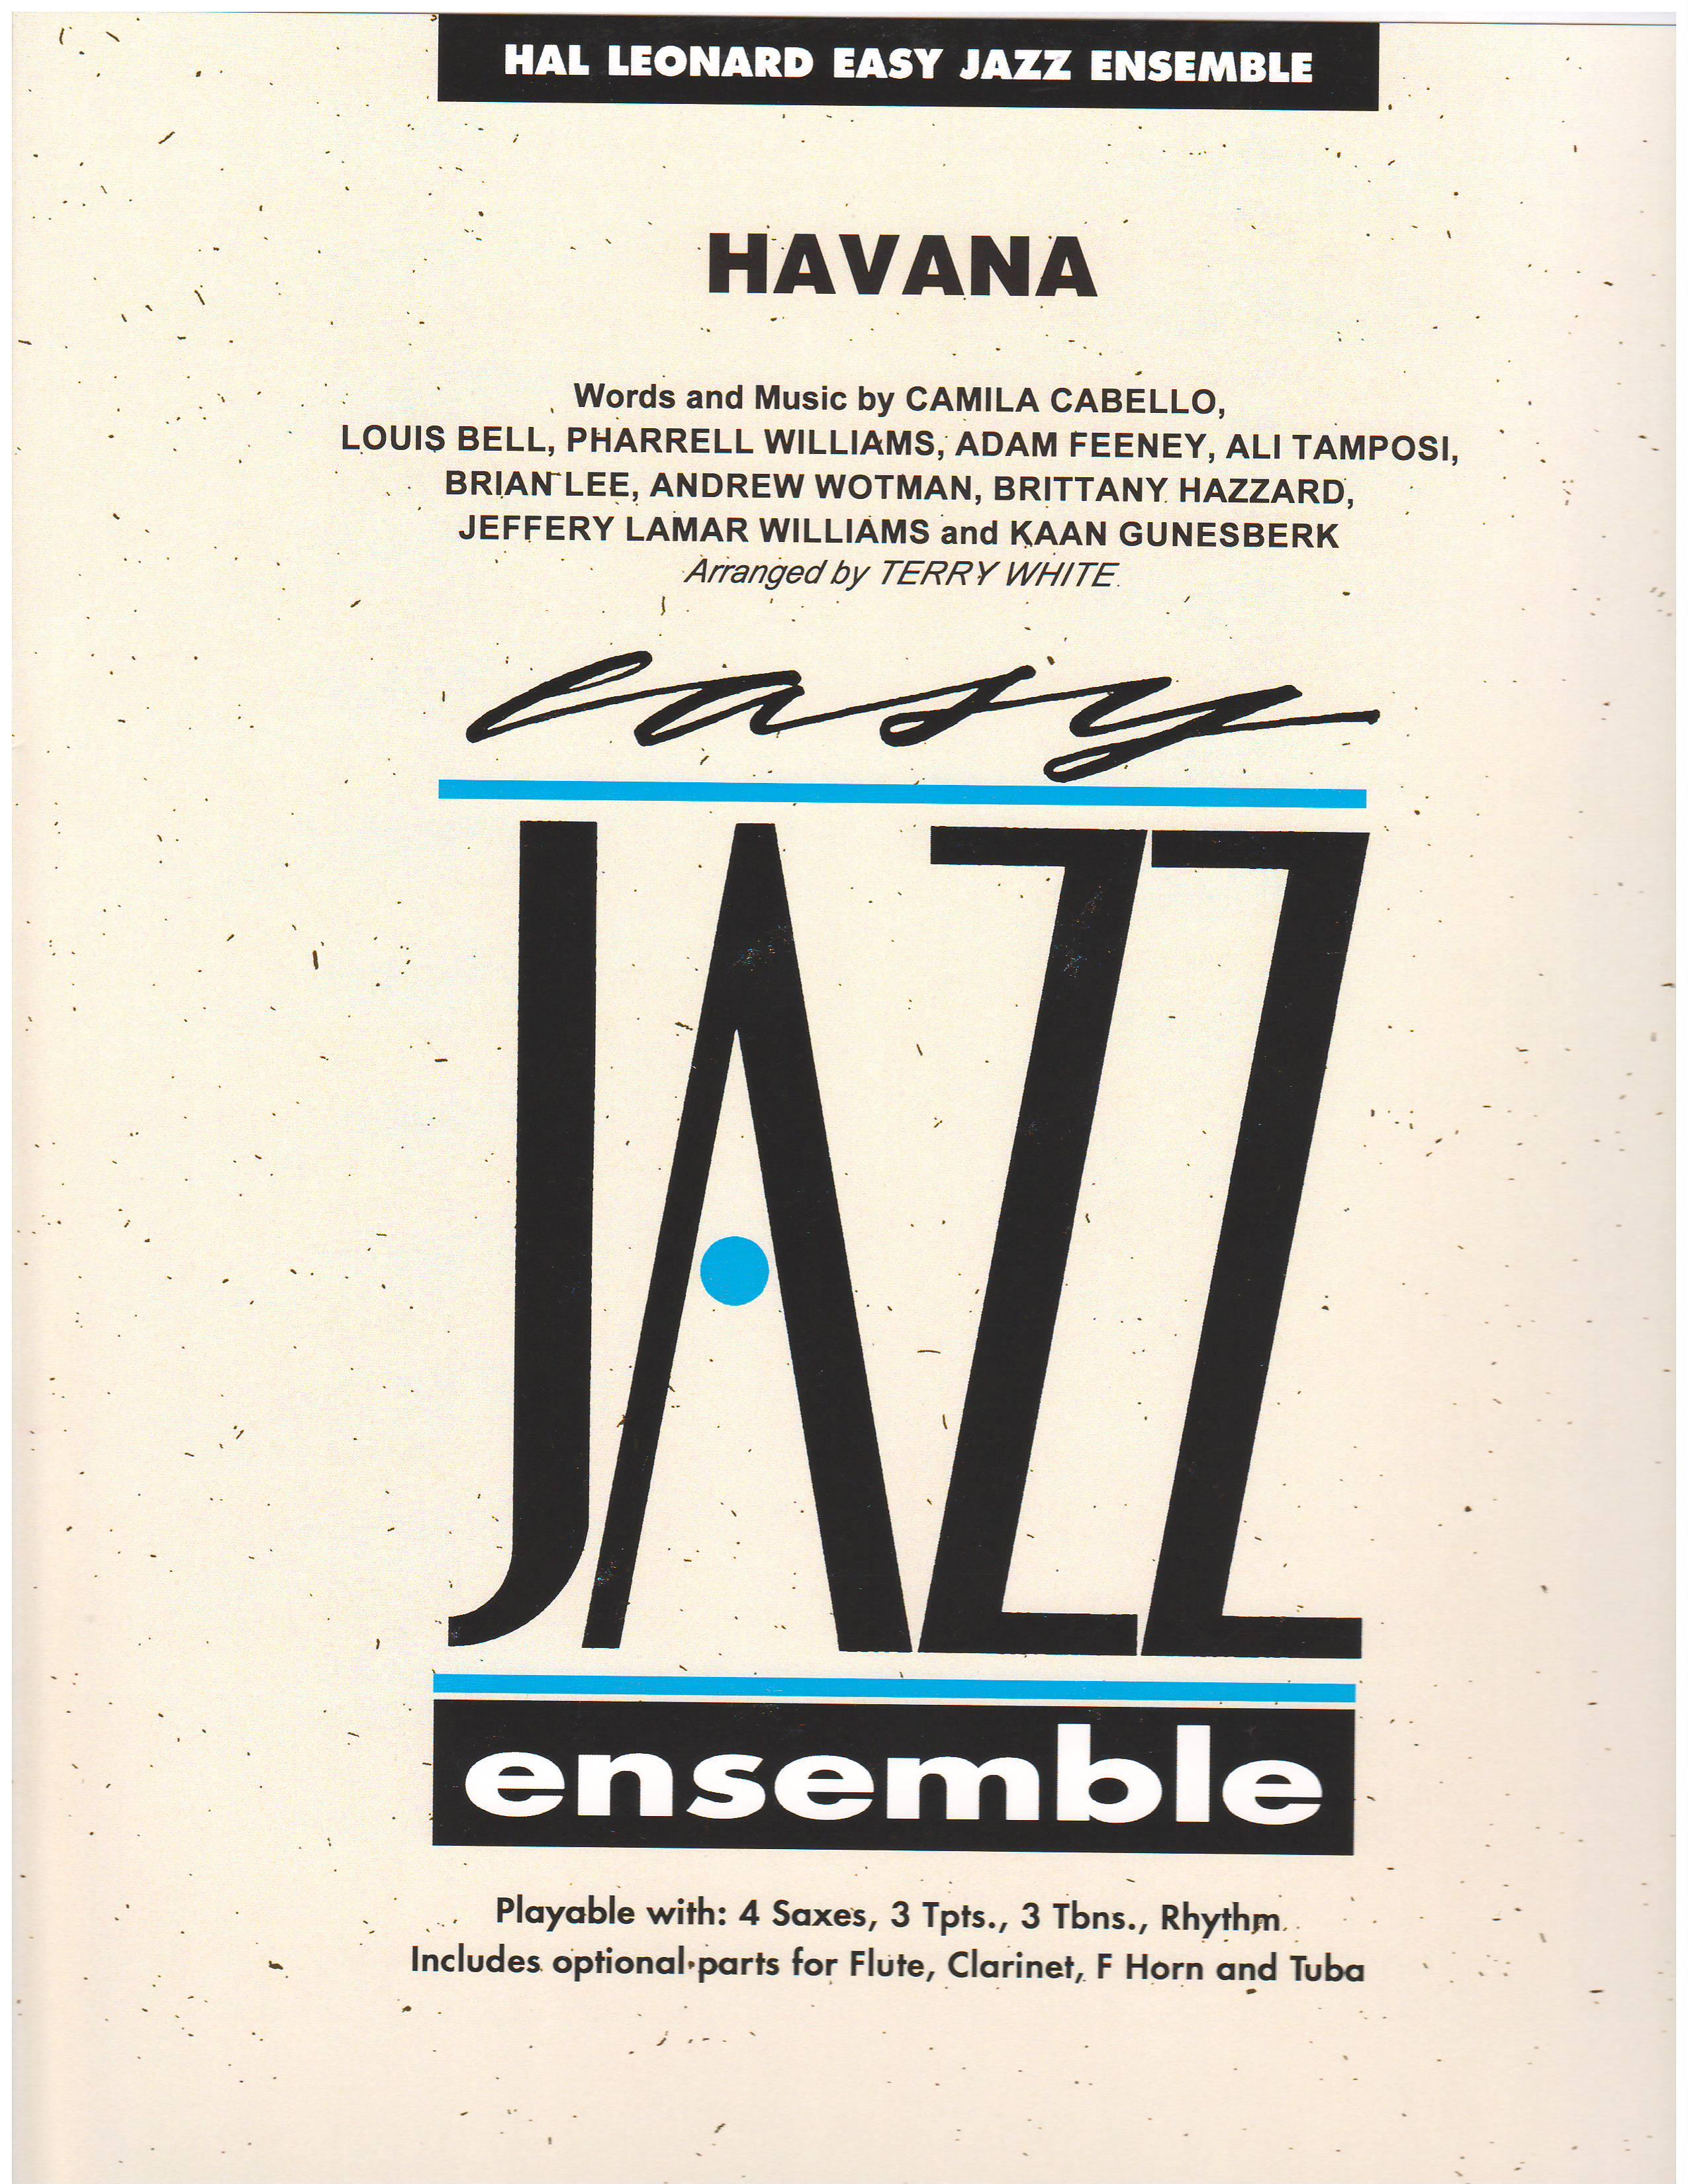 HAVANA - Jazz Ensemble (Big Band), New Releases (2019